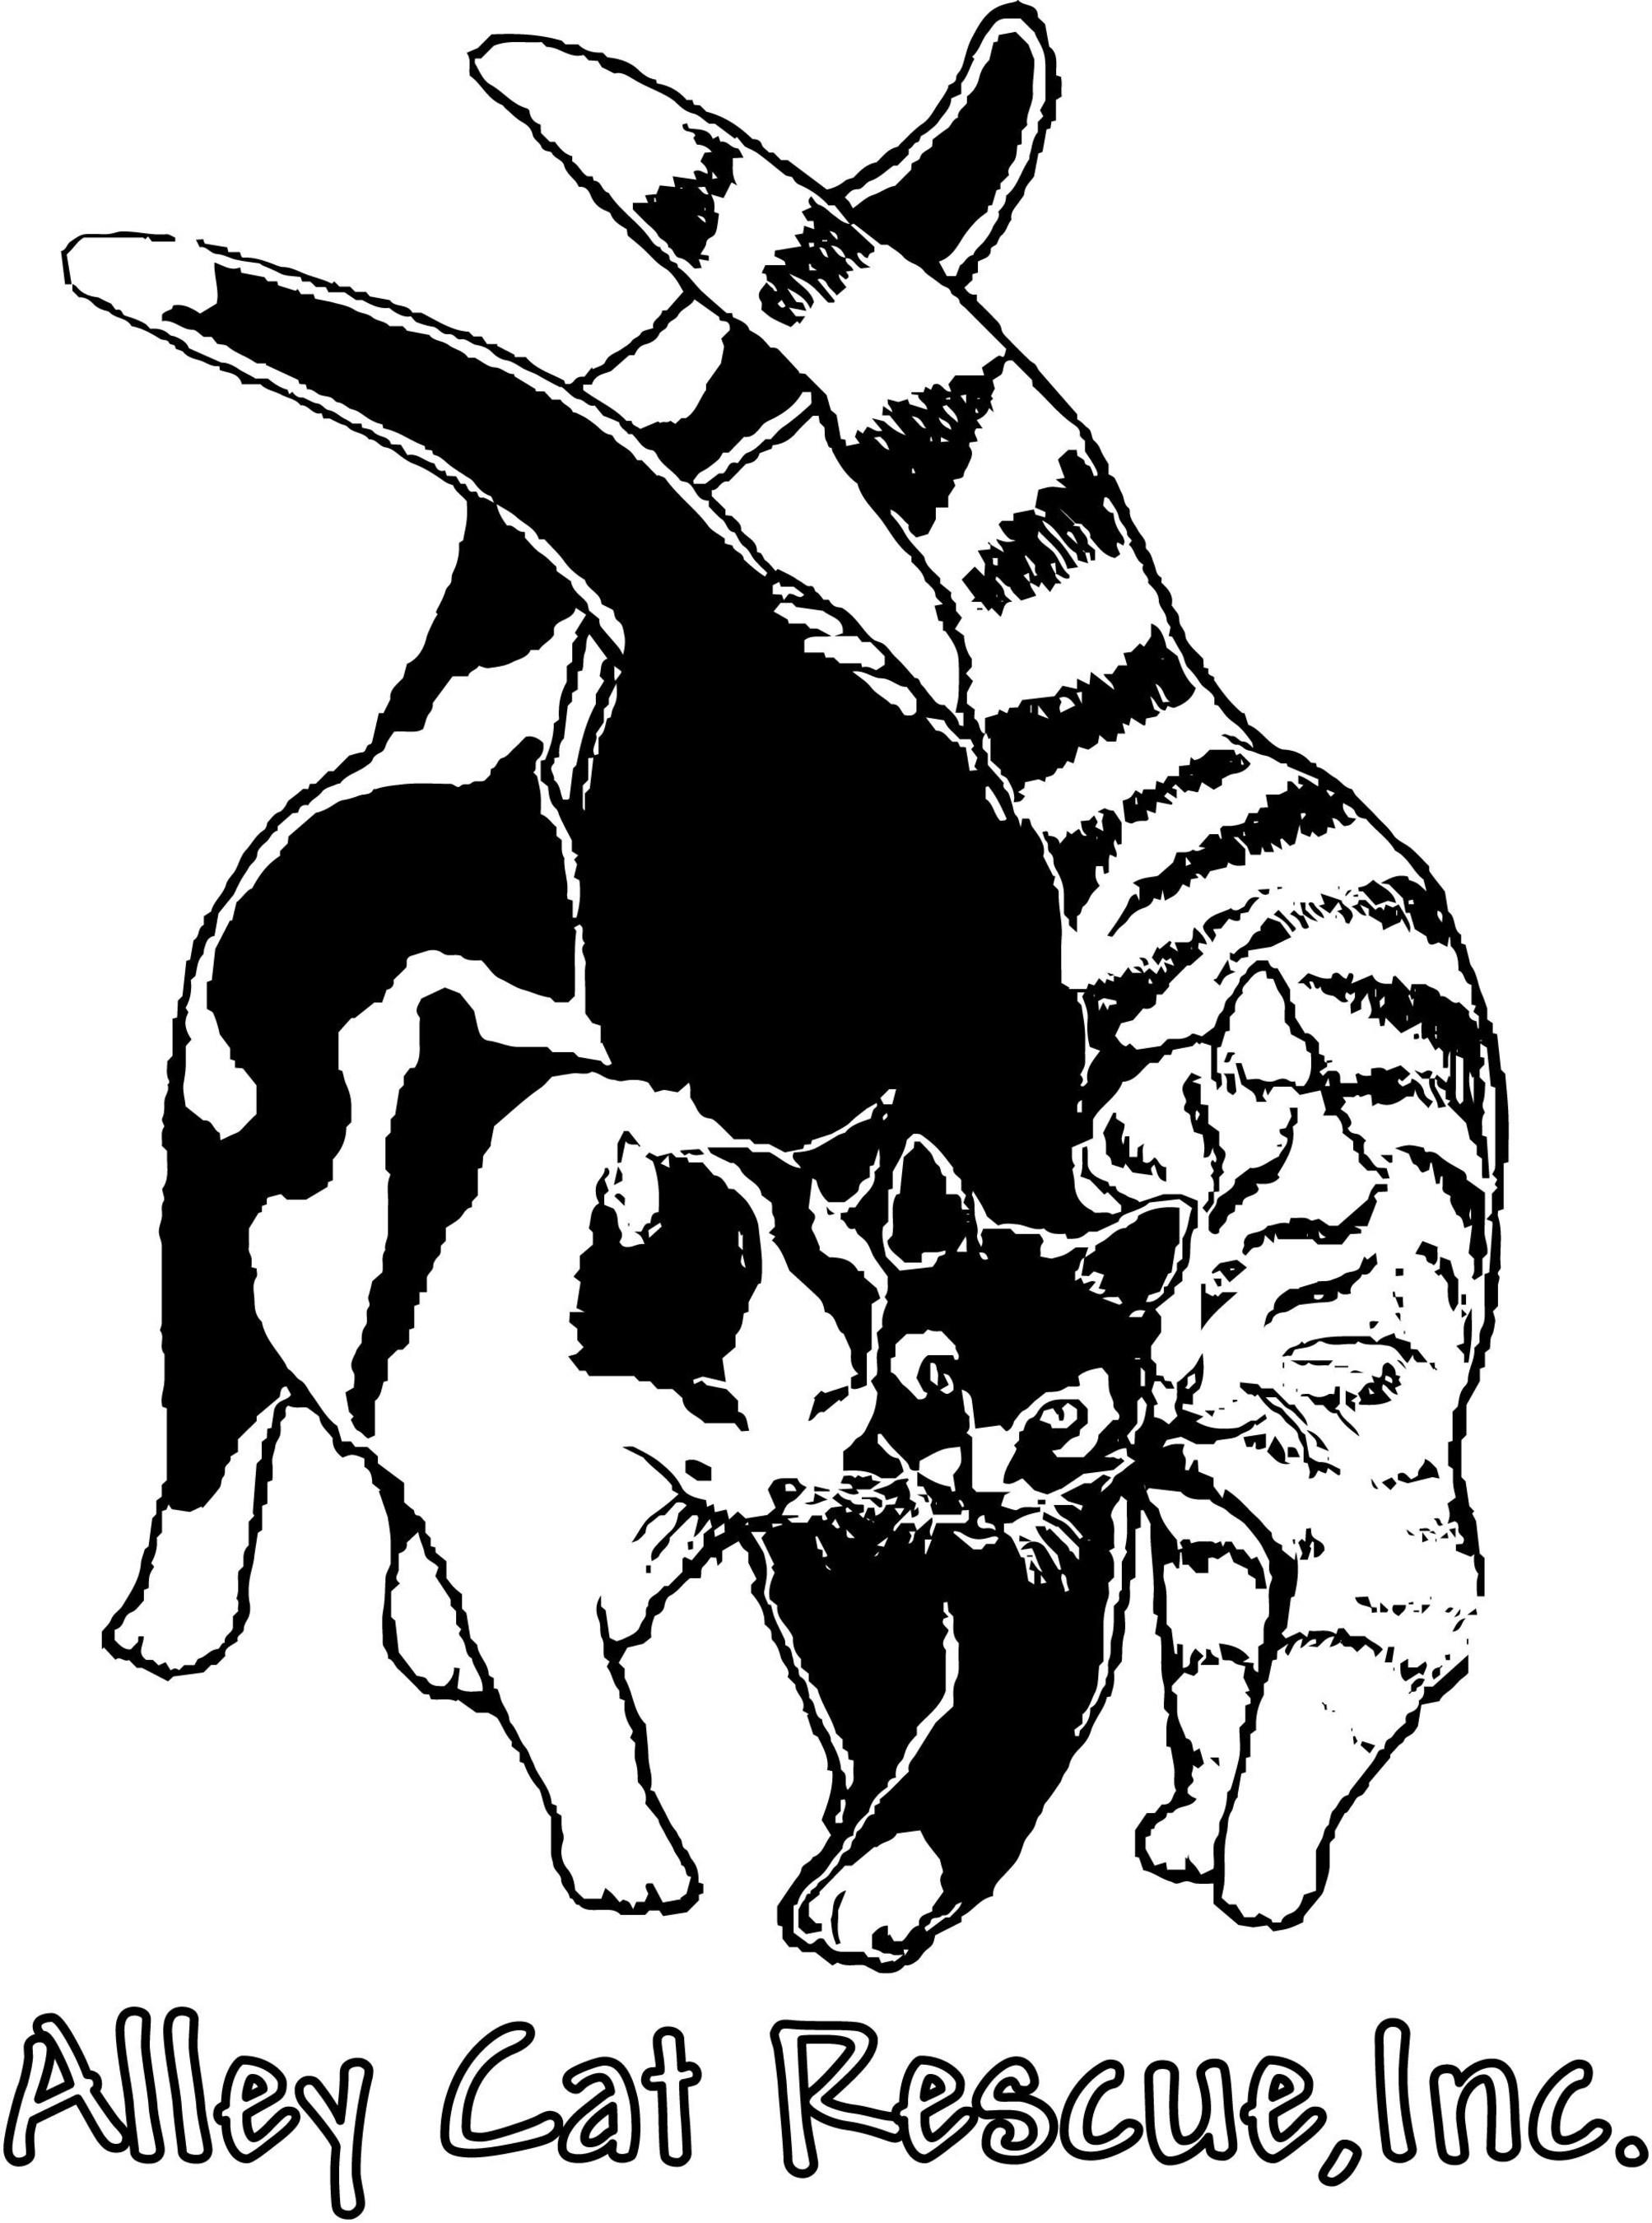 Alley Cat Rescue, Inc. logo